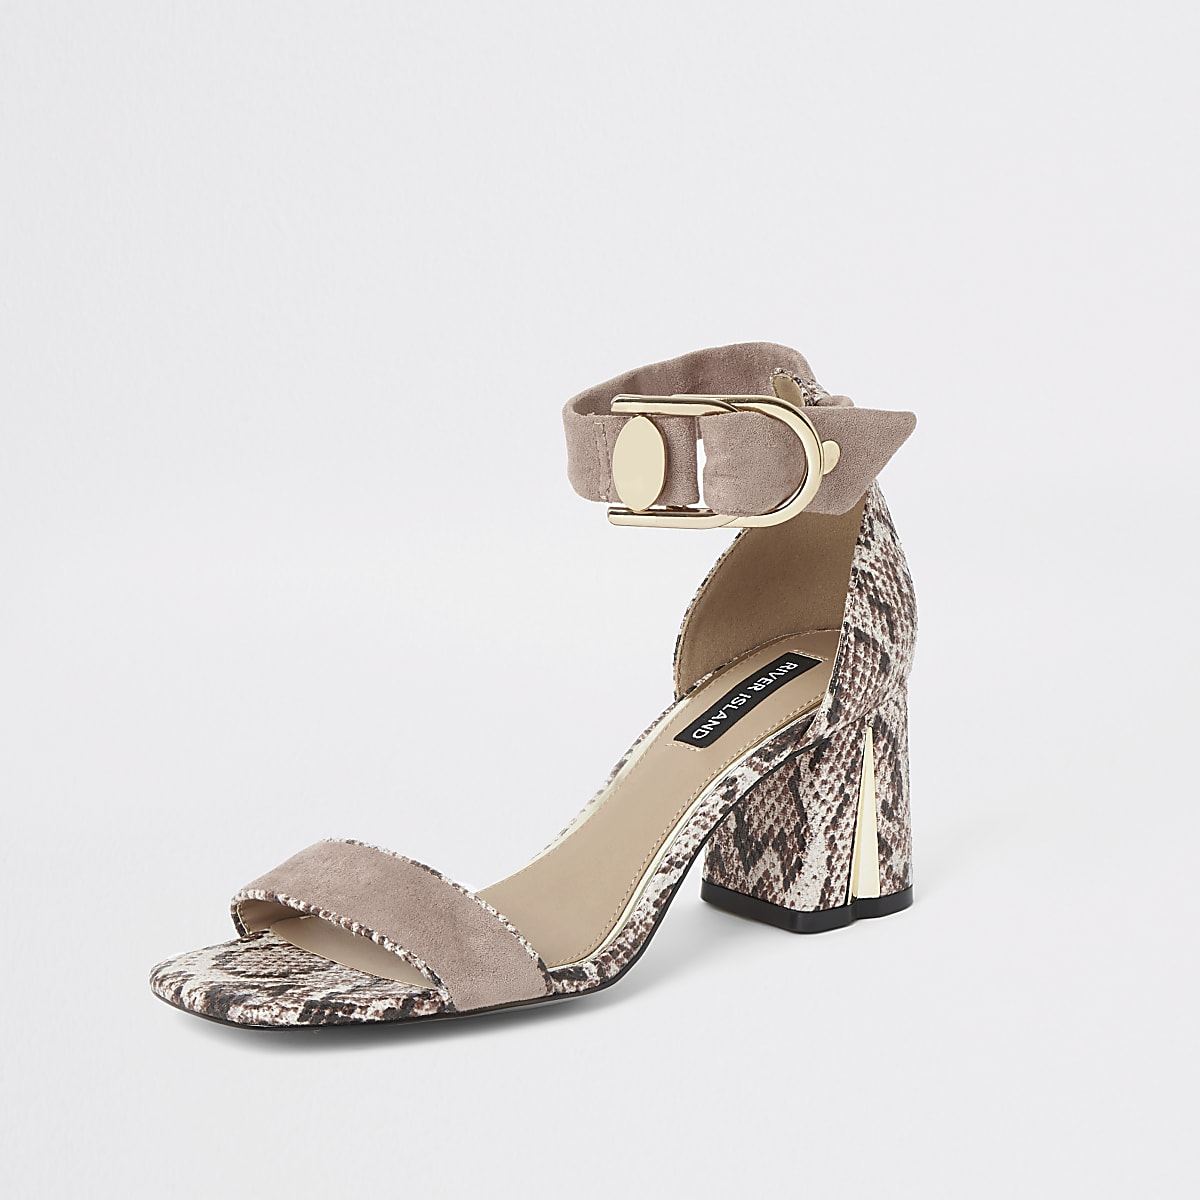 Block Sandals Heel Pink Snake Print PnO0w8kX